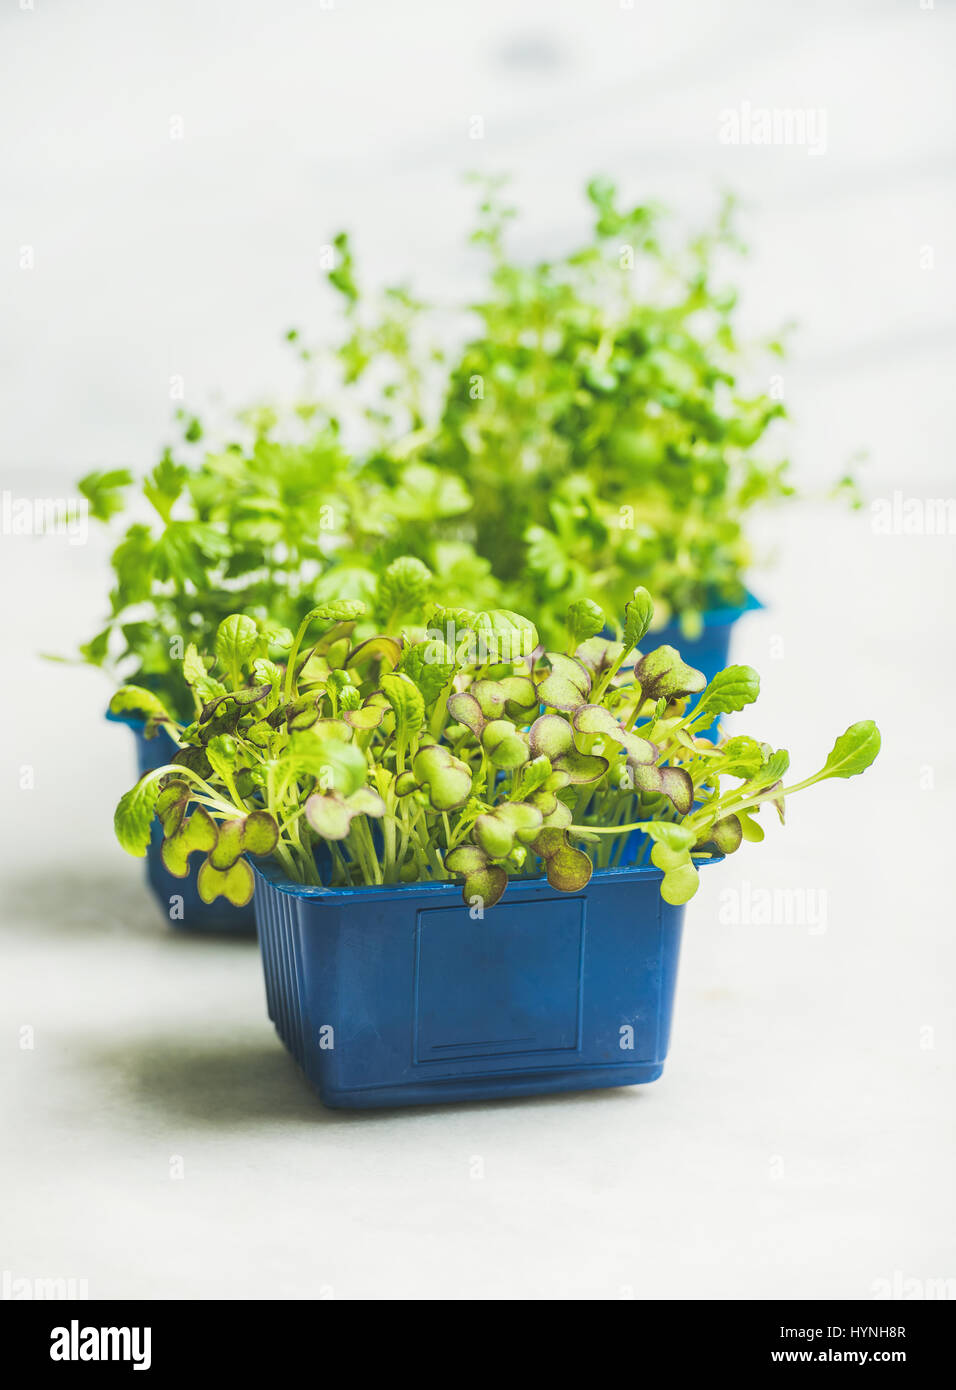 Primavera fresca verde Rábano vivo kress coles, fondo de mármol blanco Imagen De Stock